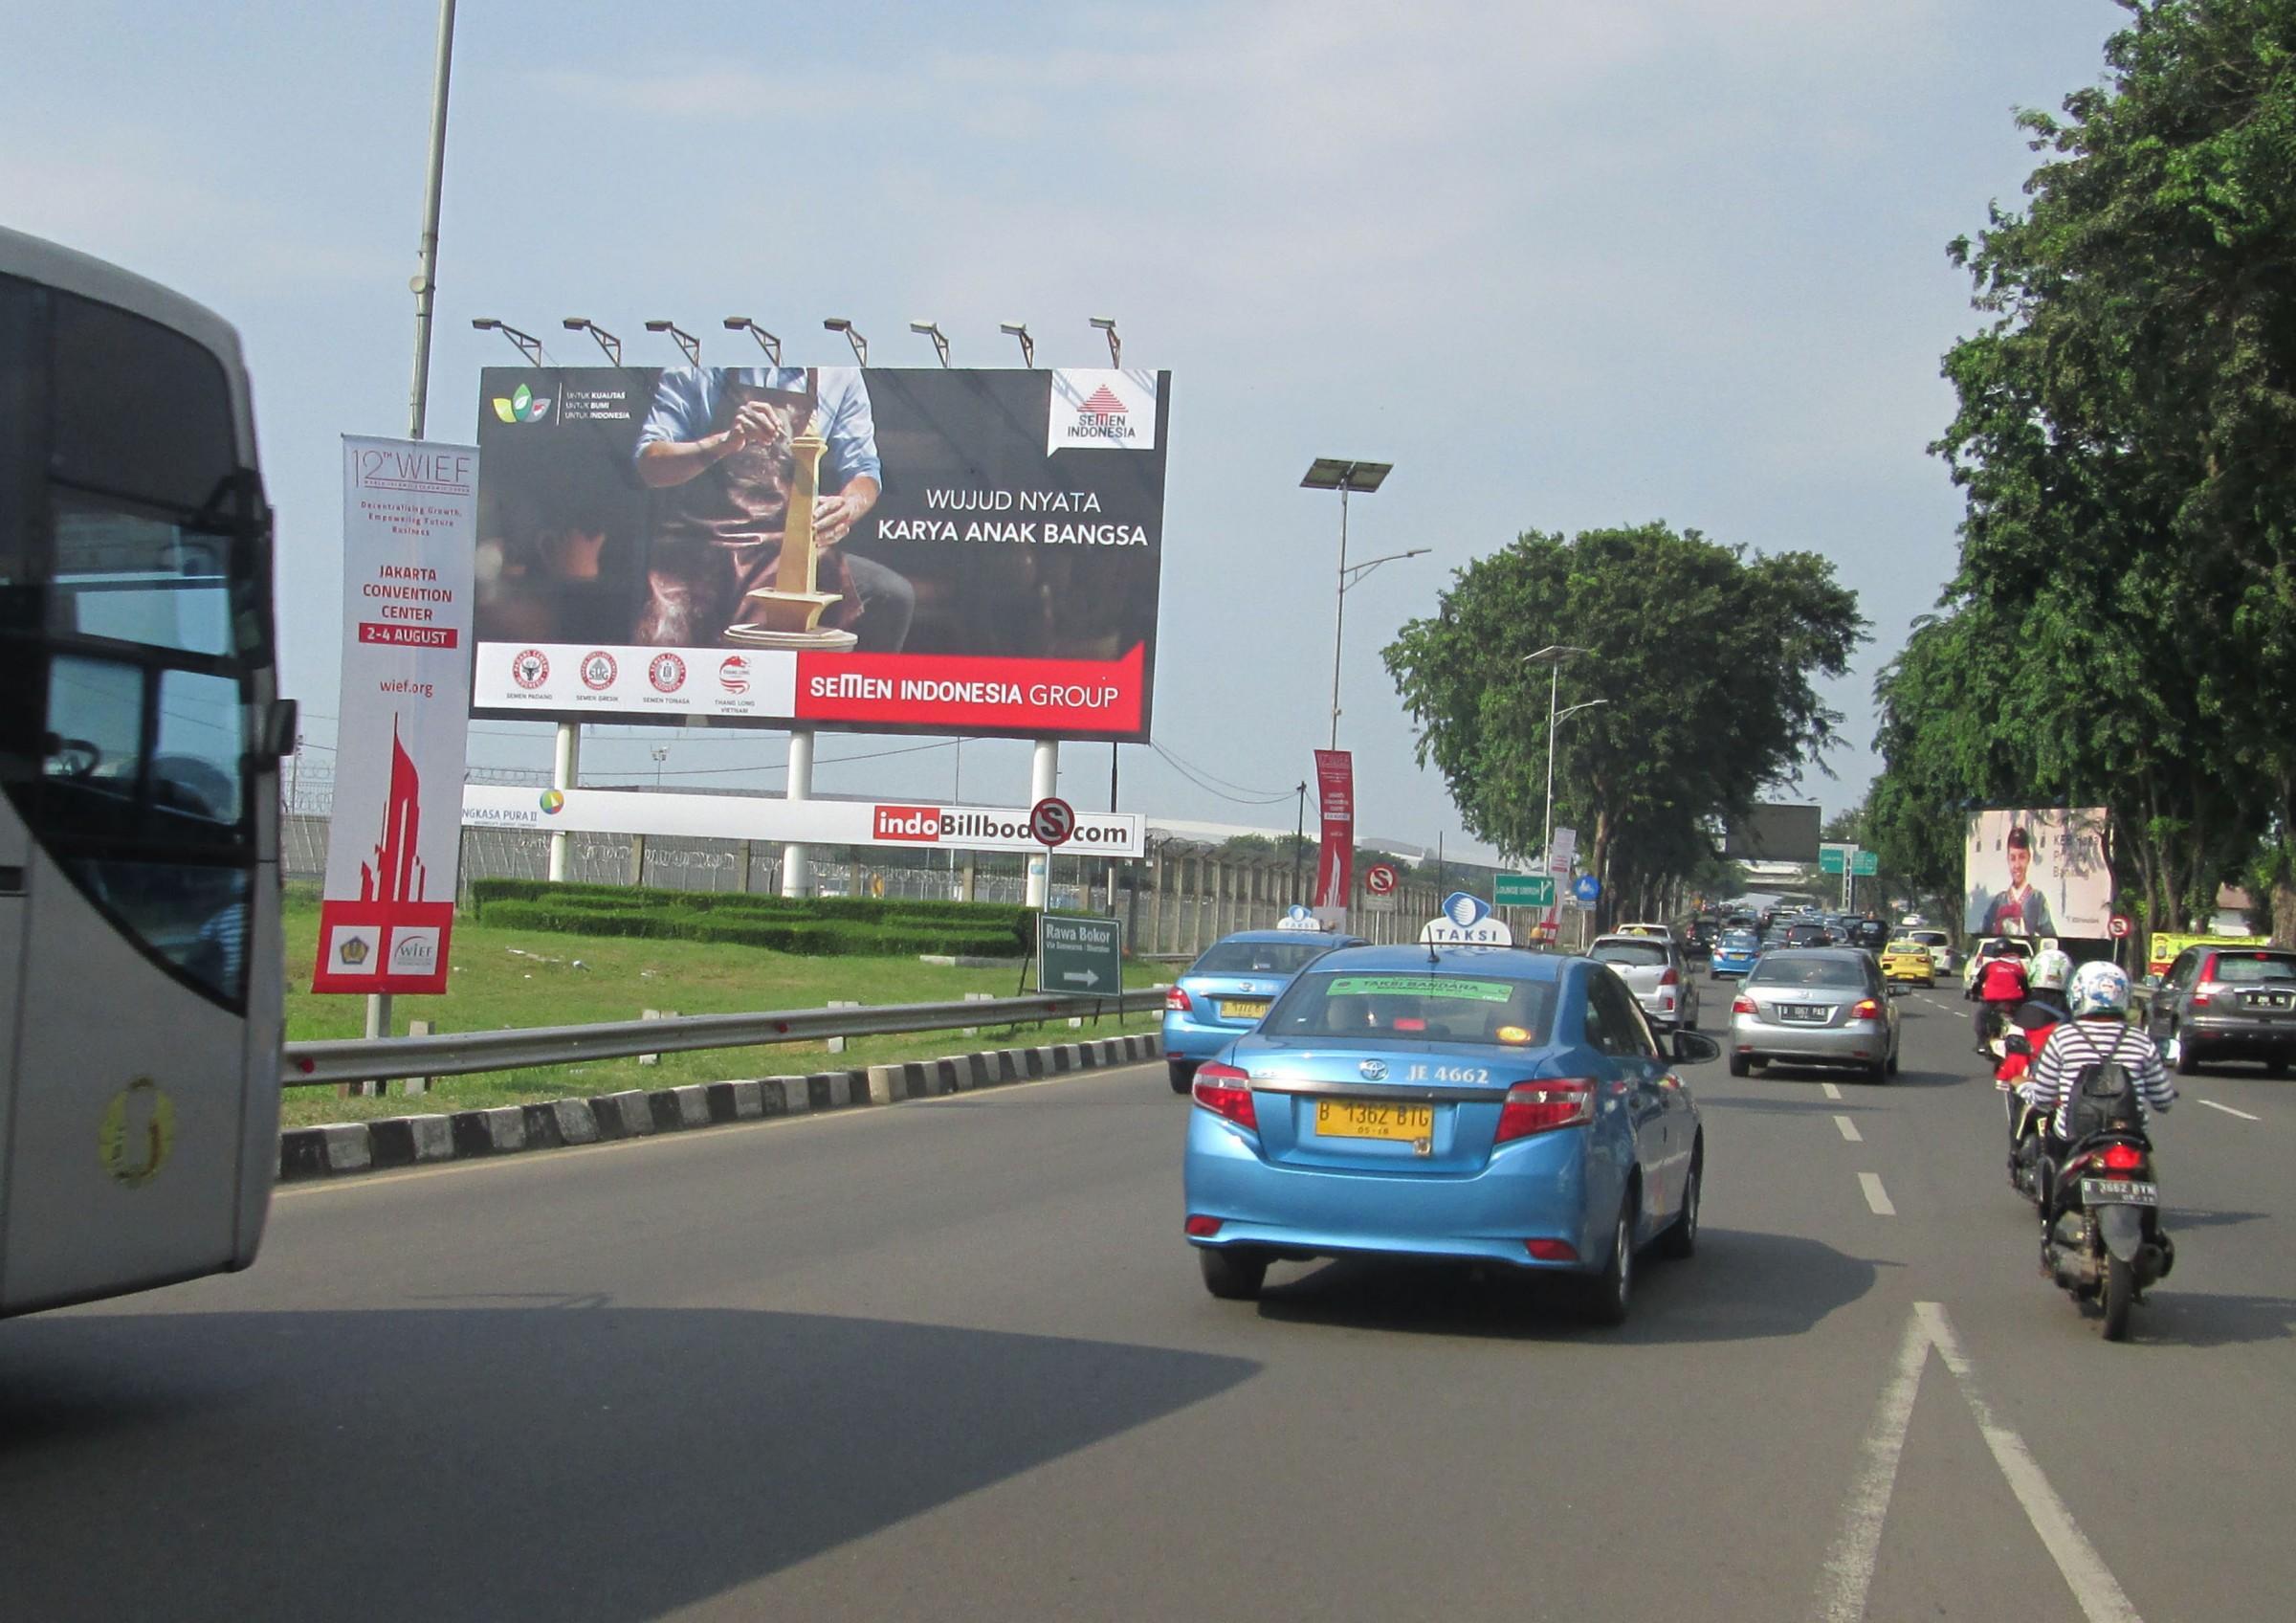 Galeri Billboard – Indoglobal Spectramatrix